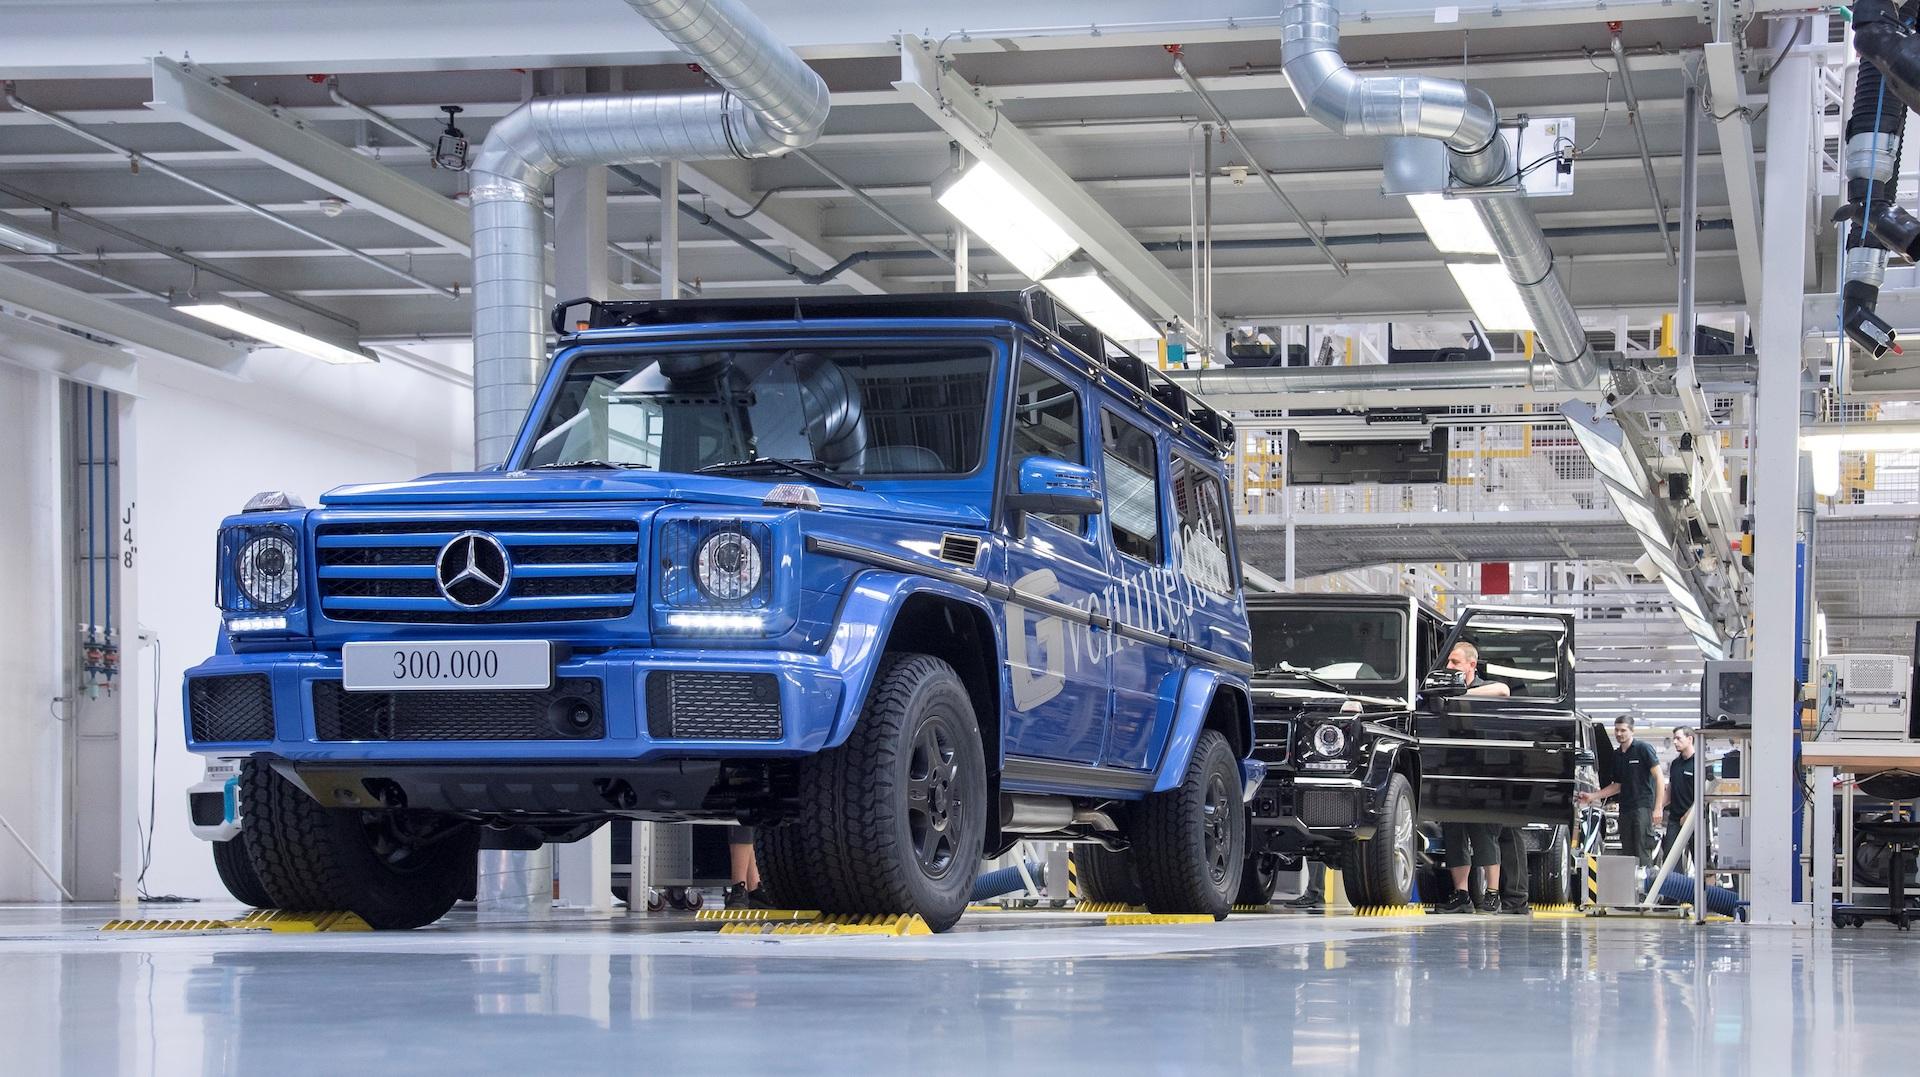 300 000th mercedes benz g class rolls off the assembly line for Mercedes benz long beach service